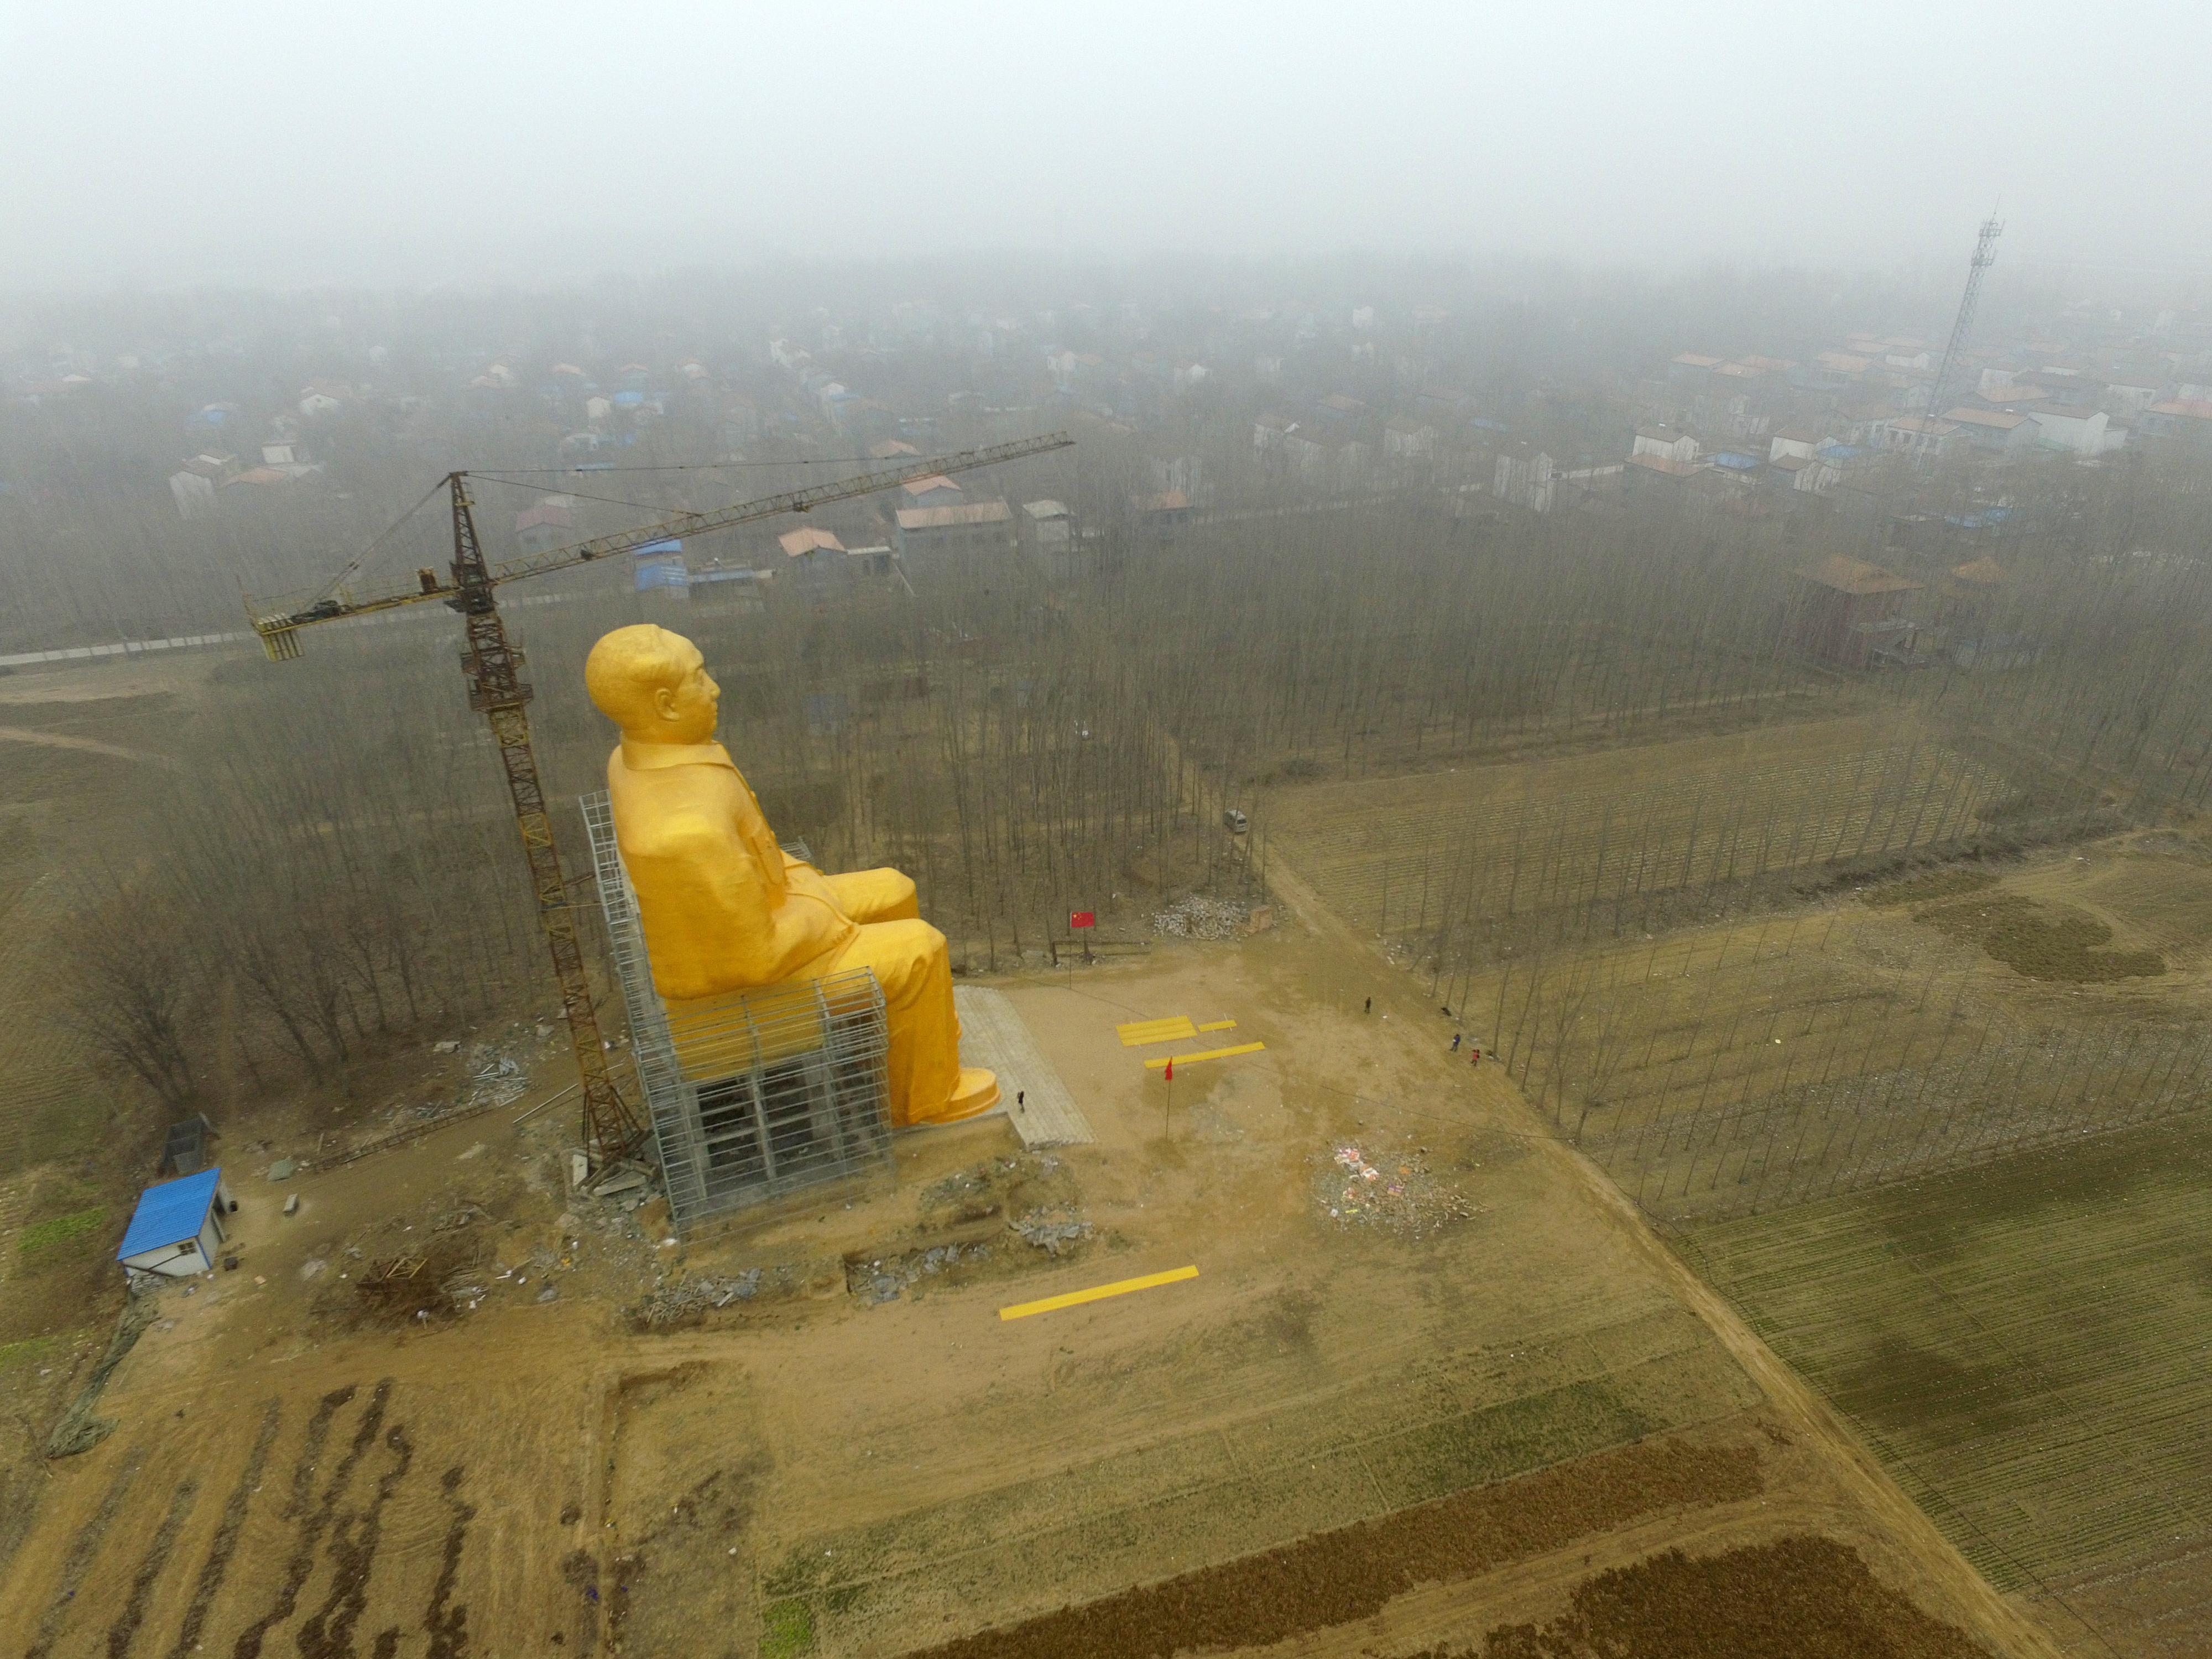 Mao Zedong Statue In Henan